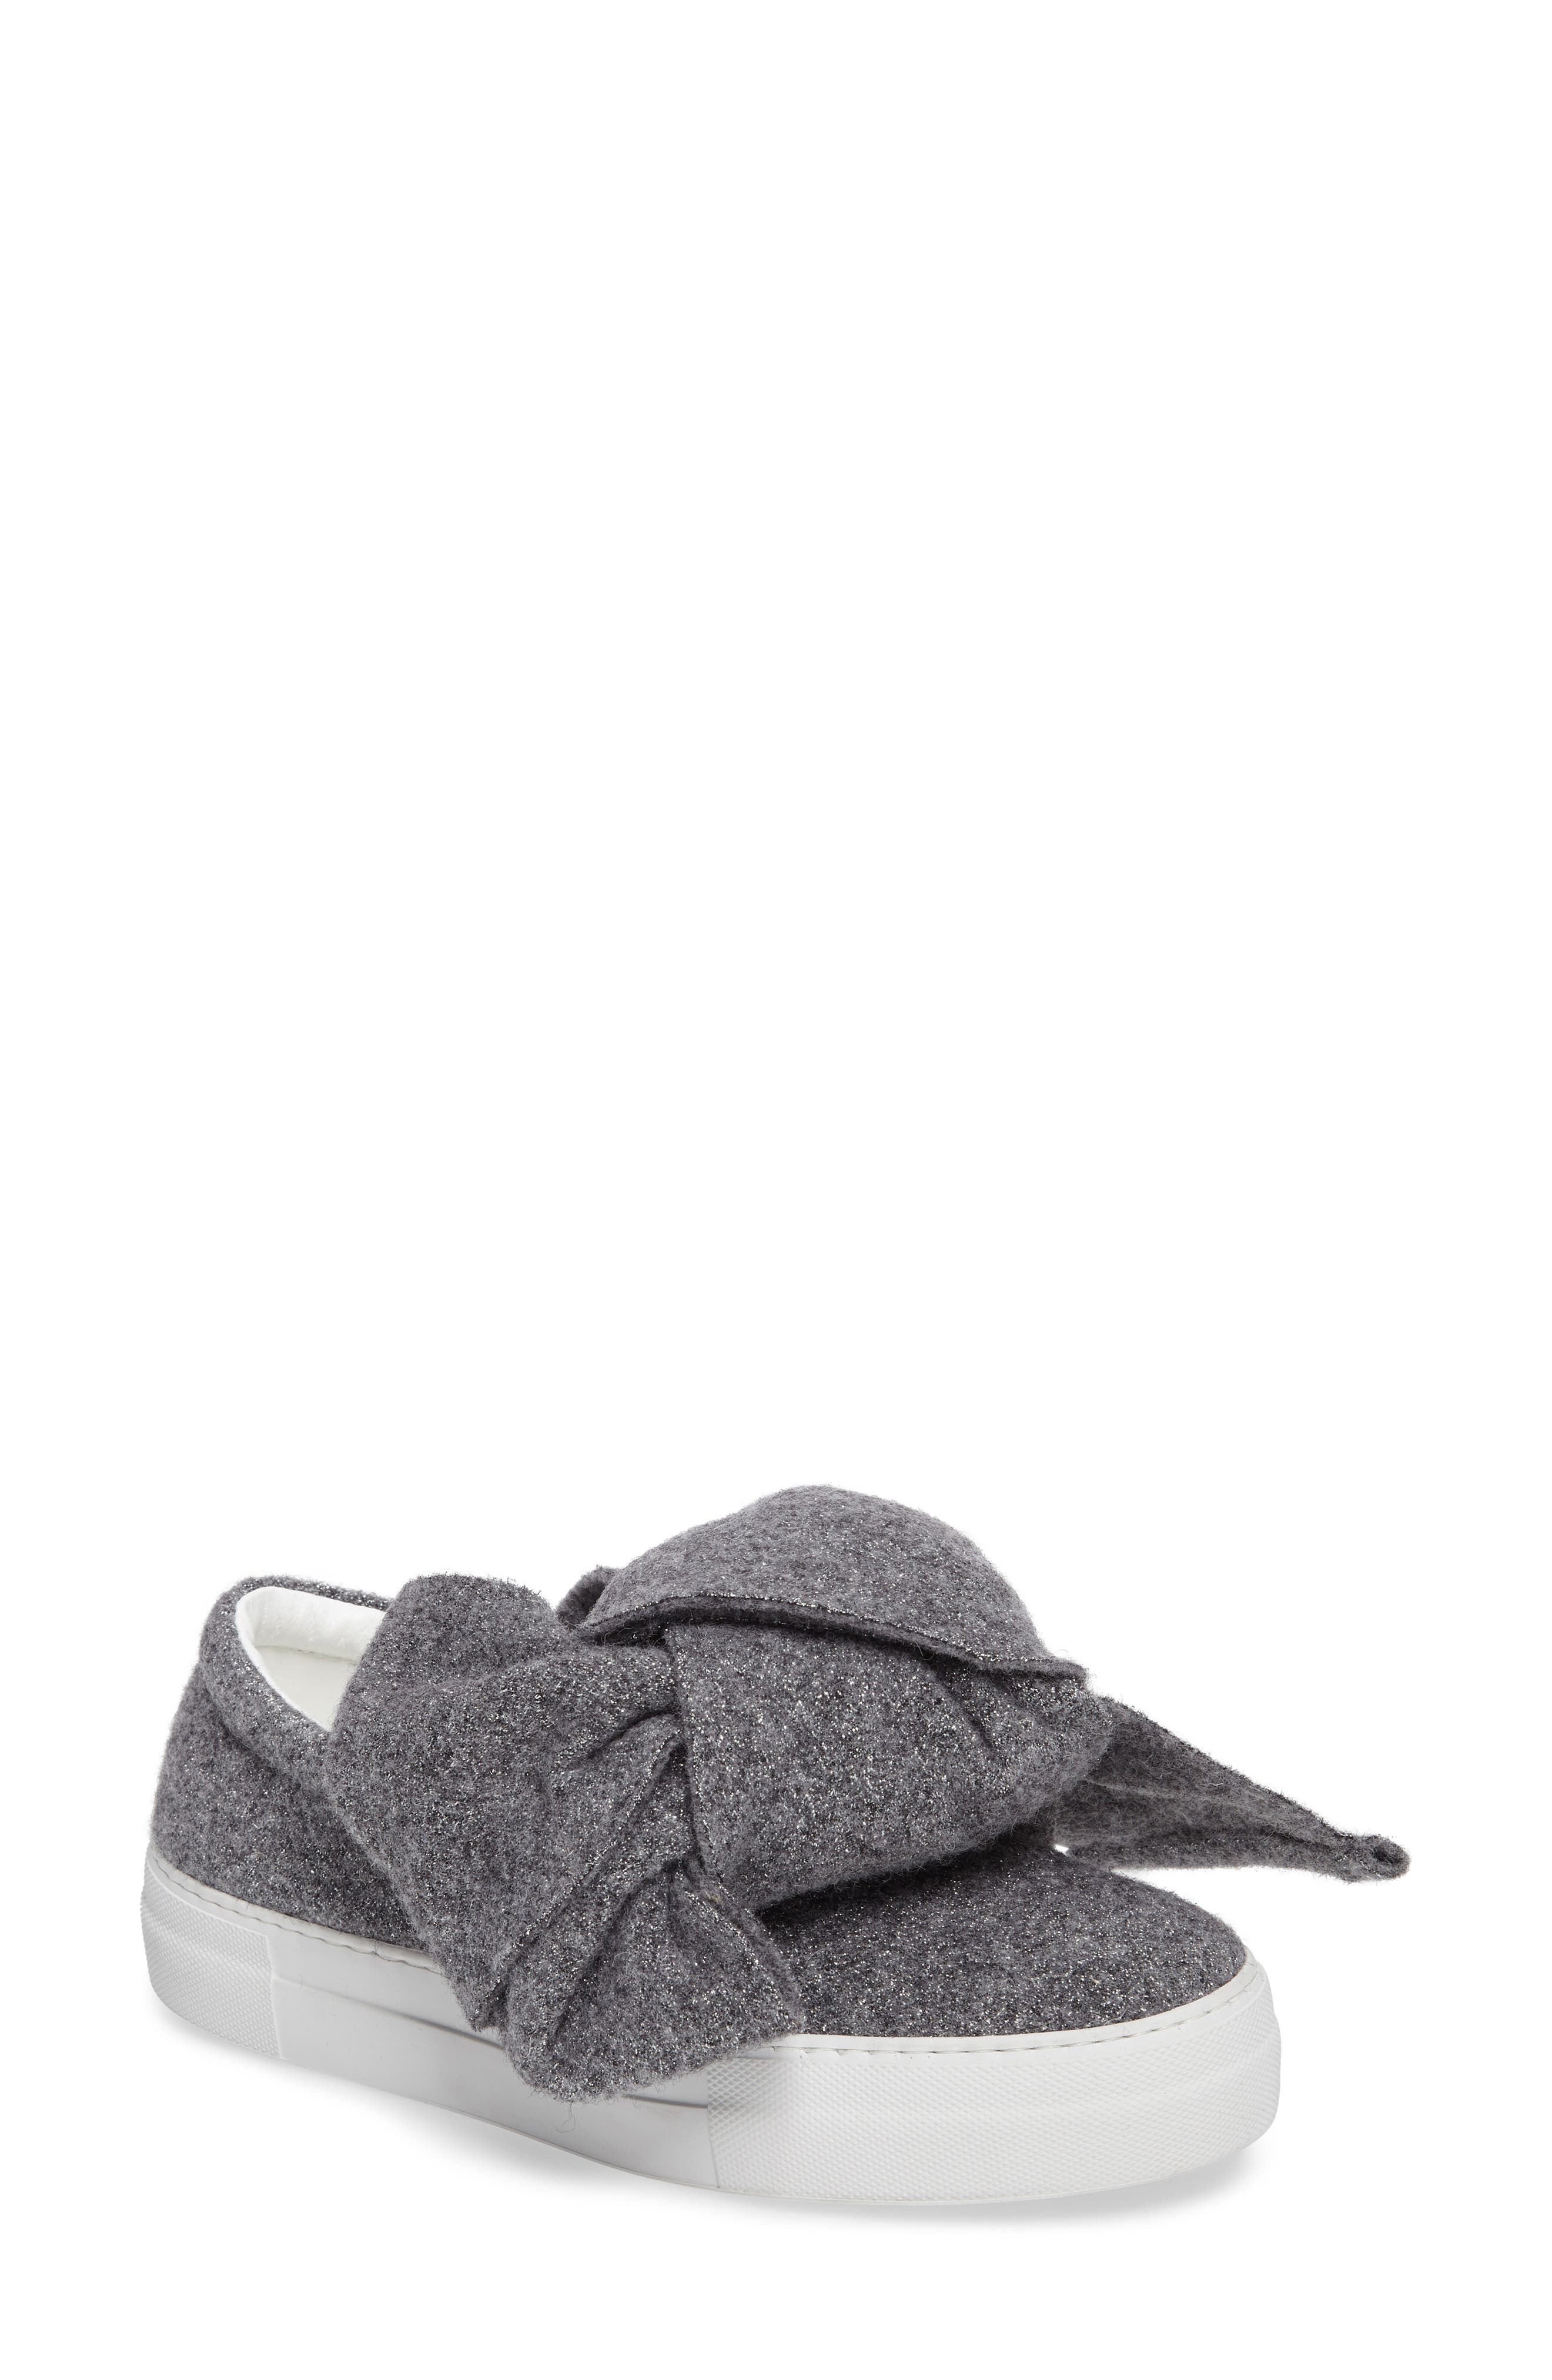 Bow Slip-On Sneaker,                         Main,                         color, Grey Lurex Felt